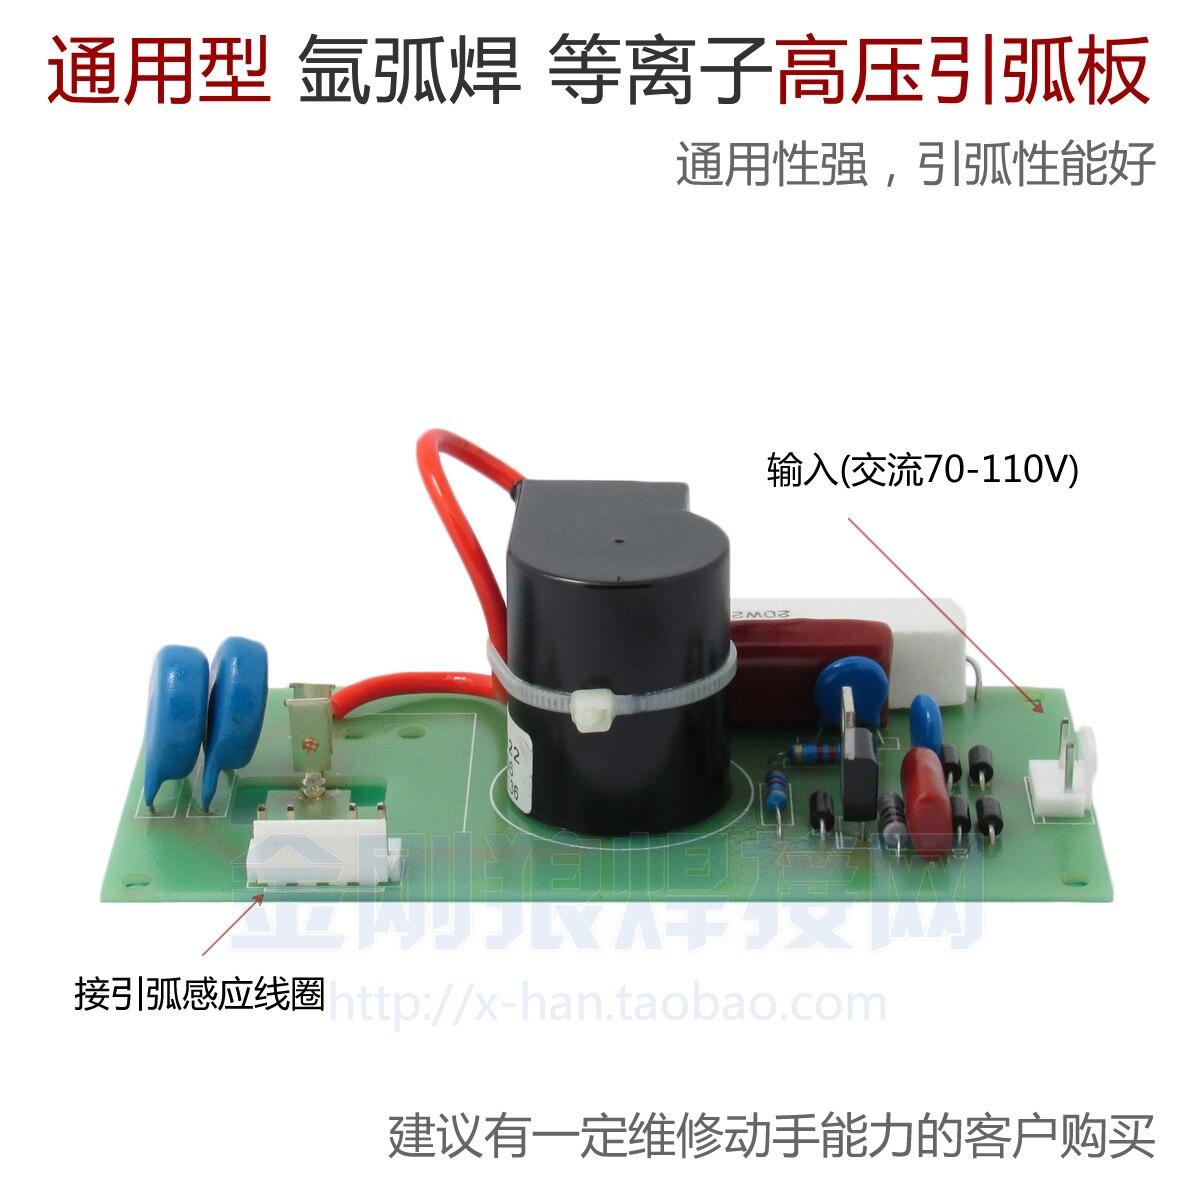 все цены на SCR Arc Welding High Pressure Plate Plasma Cutting Argon Arc Welding Machine Arc Plate Circuit Board High Frequency Plate онлайн